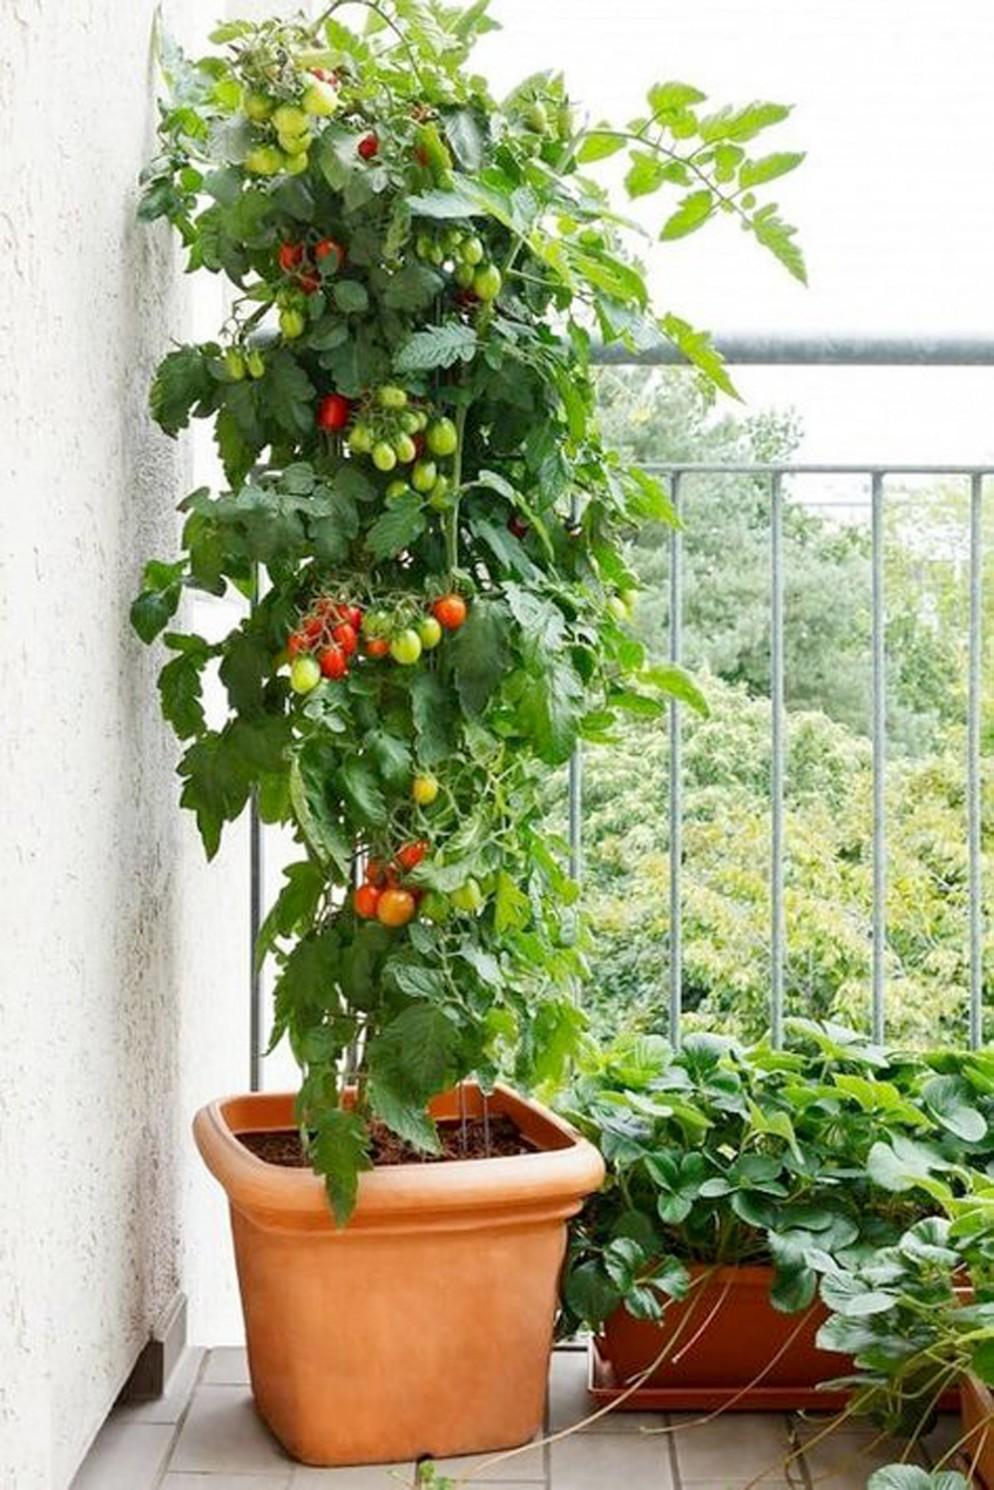 piante-da-balcone-resistenti-8. etsy.com-livingcorriere